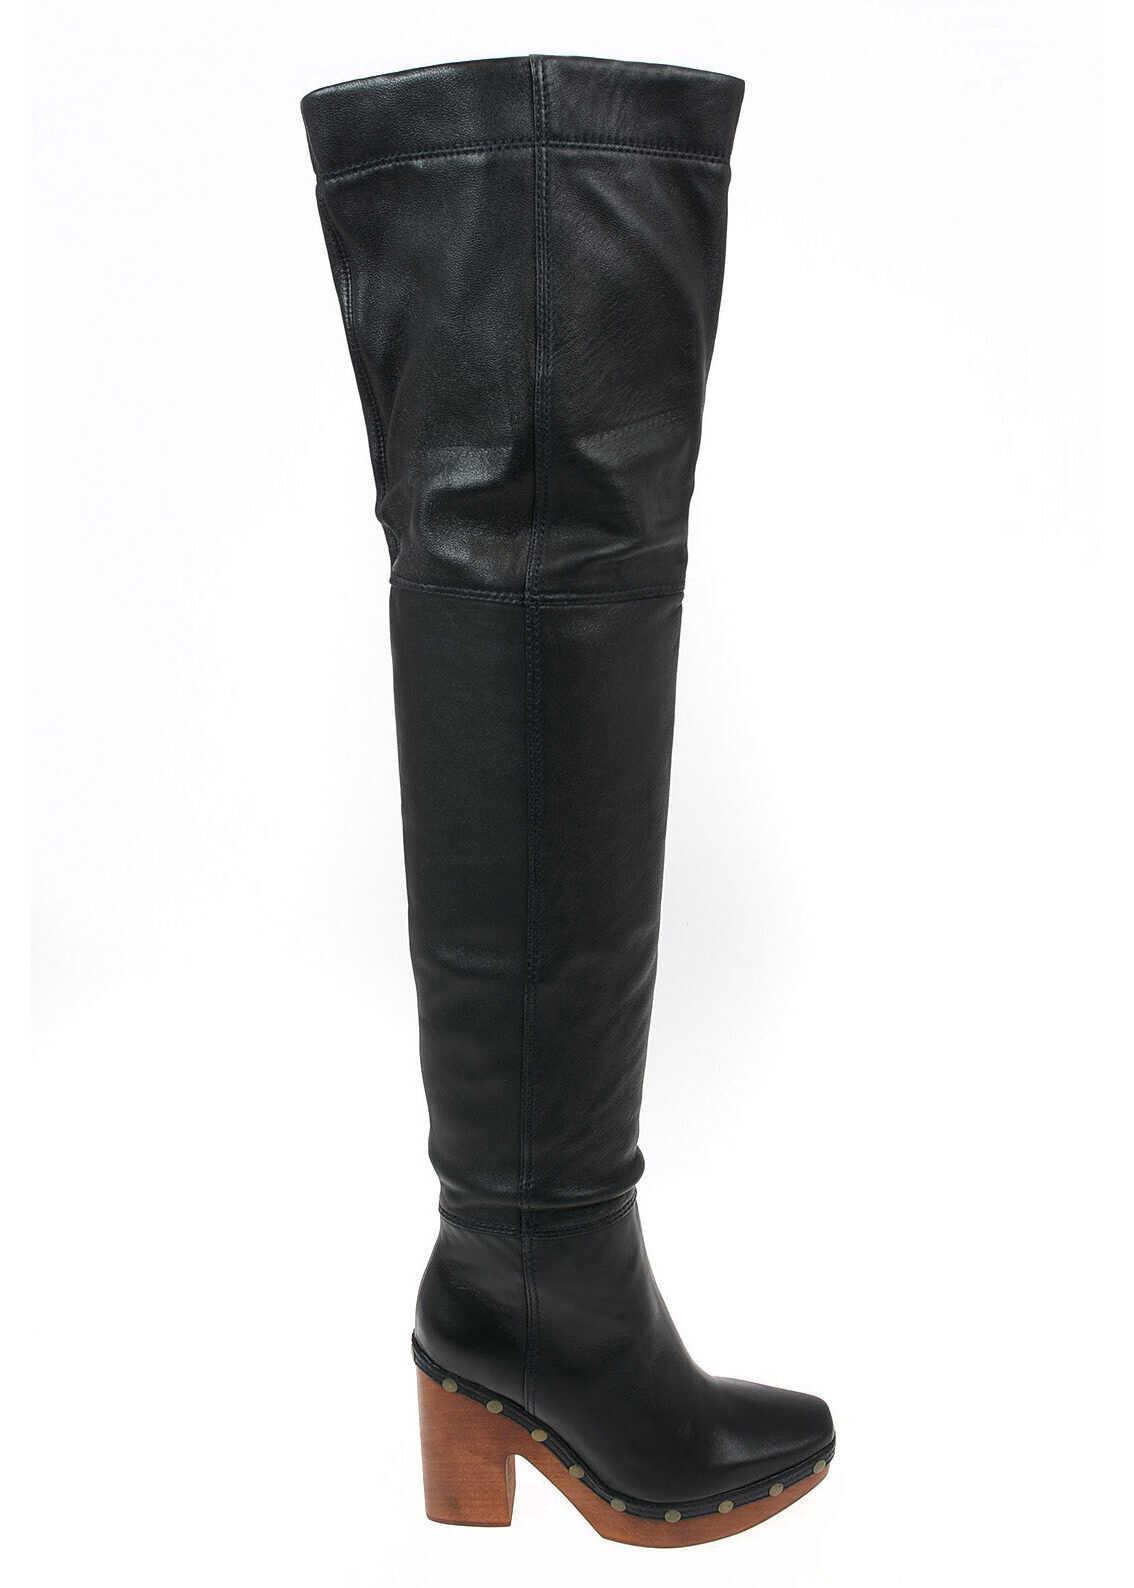 JACQUEMUS 11cm Leather Cuissard BLACK imagine b-mall.ro